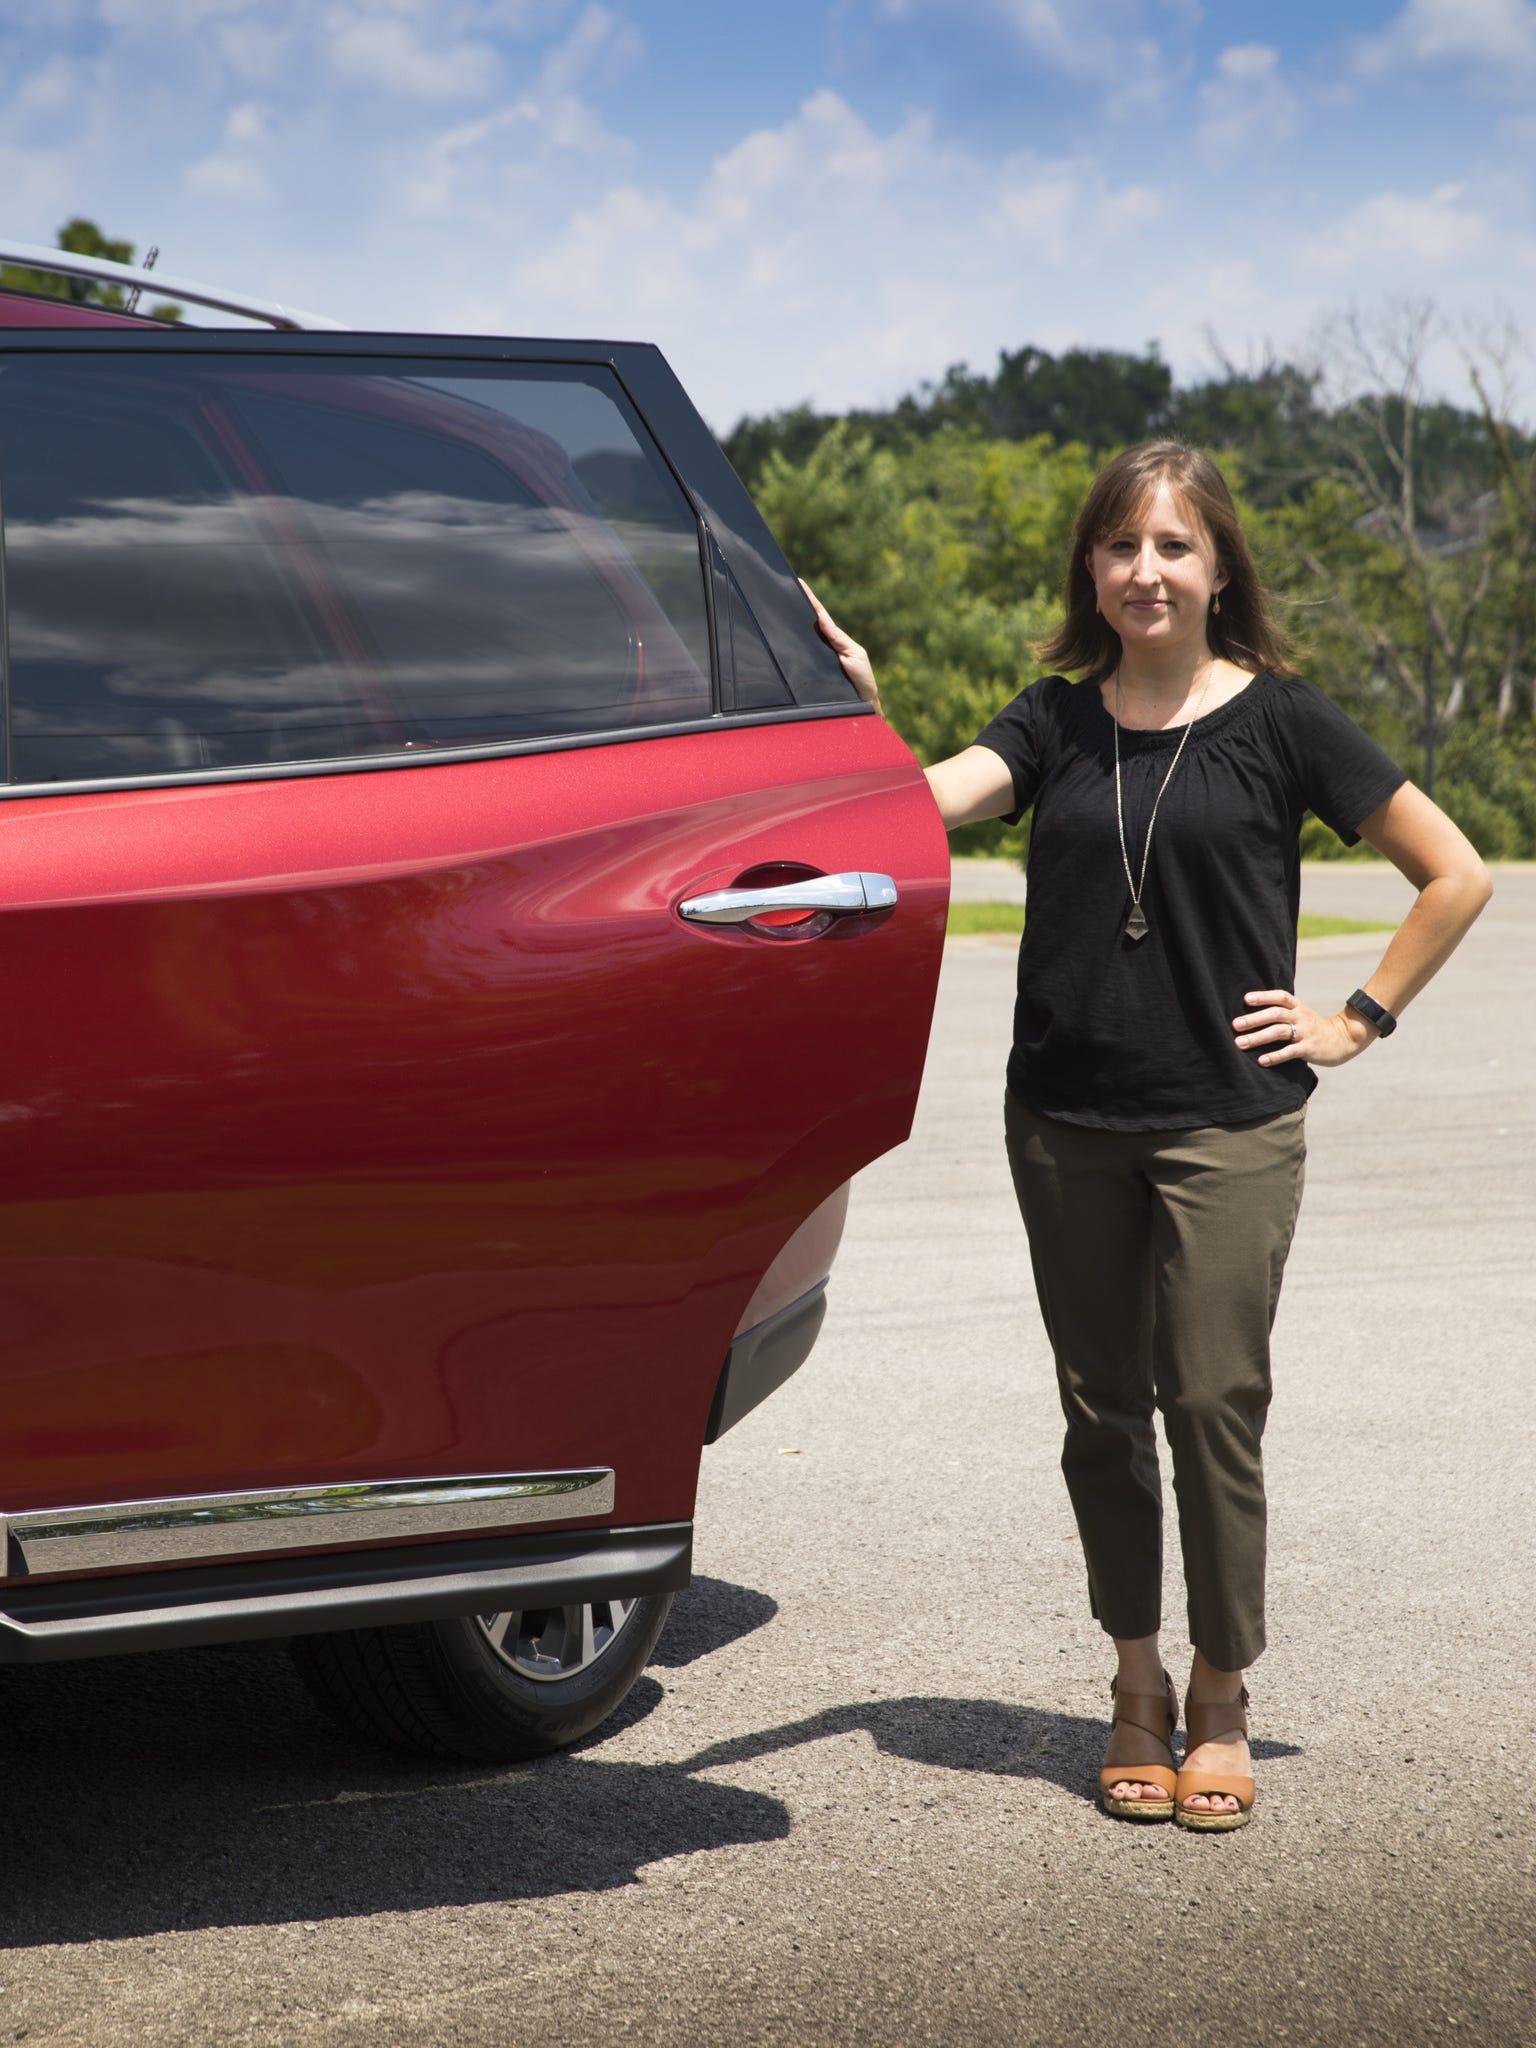 Nissan engineer Elsa Foley co-developed a rear-door alert system for the automaker.